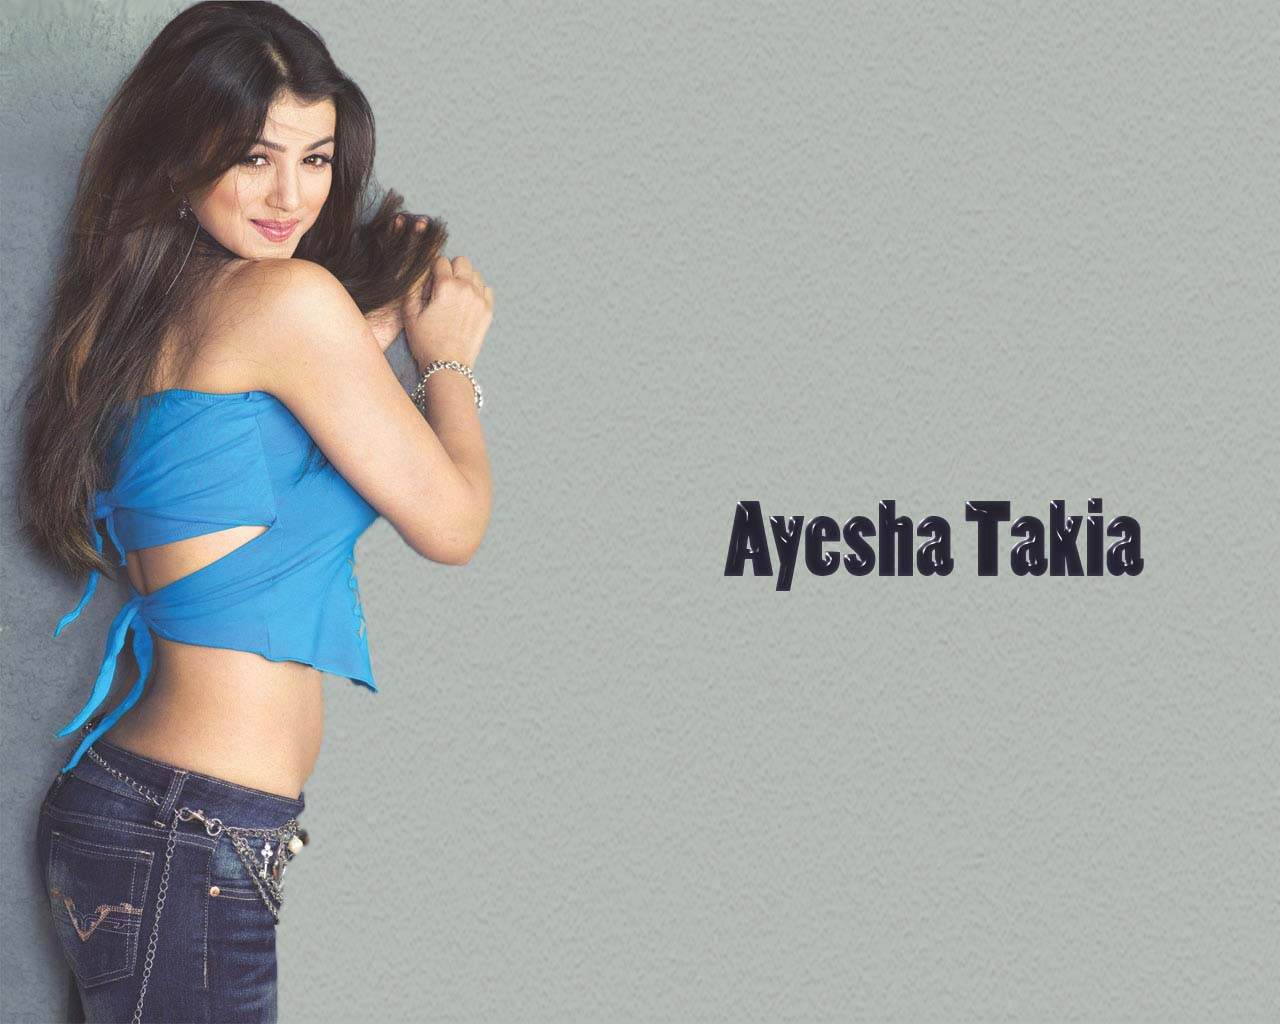 Hot Photo Gallery 2015: Ayesha Takia hd 2014 Wallpaper